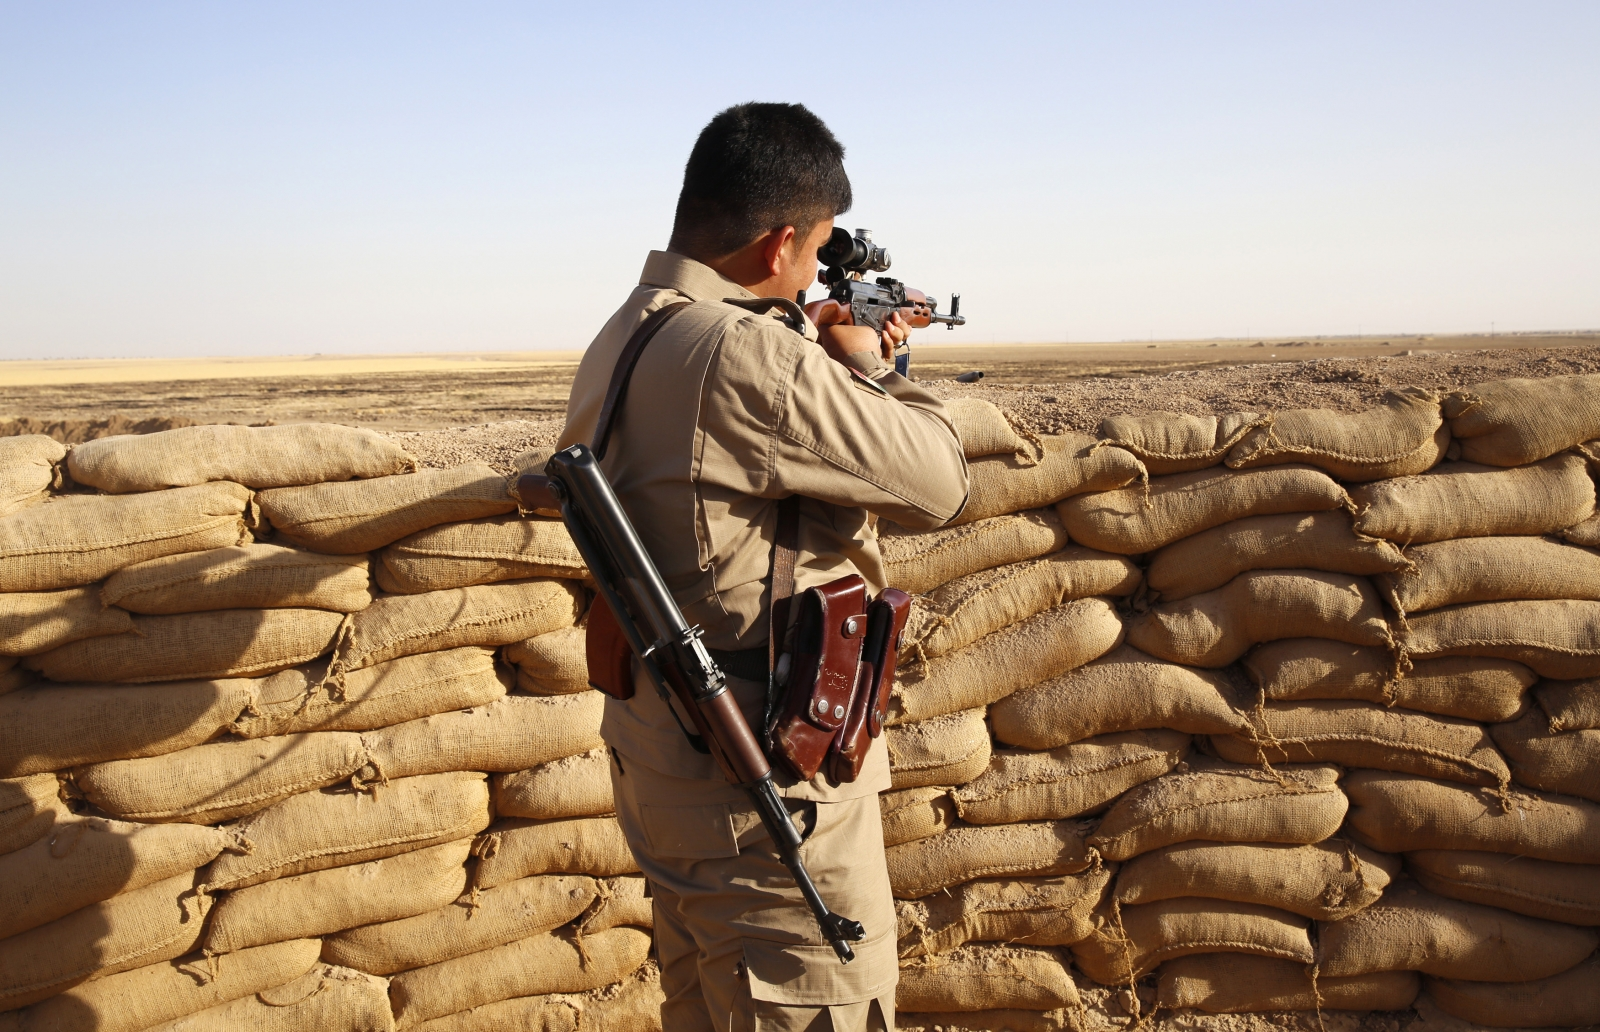 British troops in Iraq to train Kurdish forces